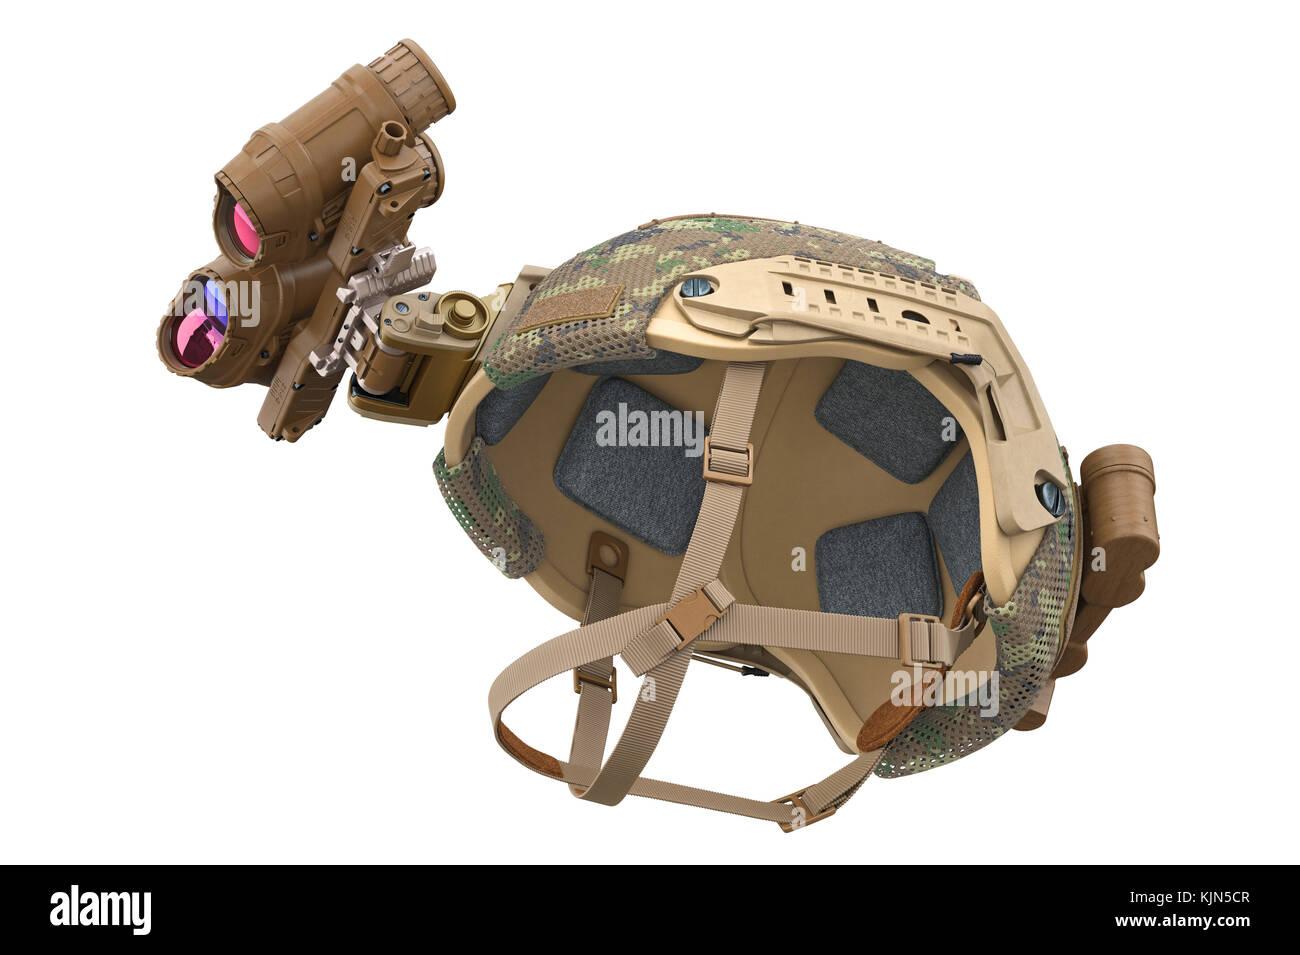 Helmet military protection Stock Photo: 166422391 - Alamy